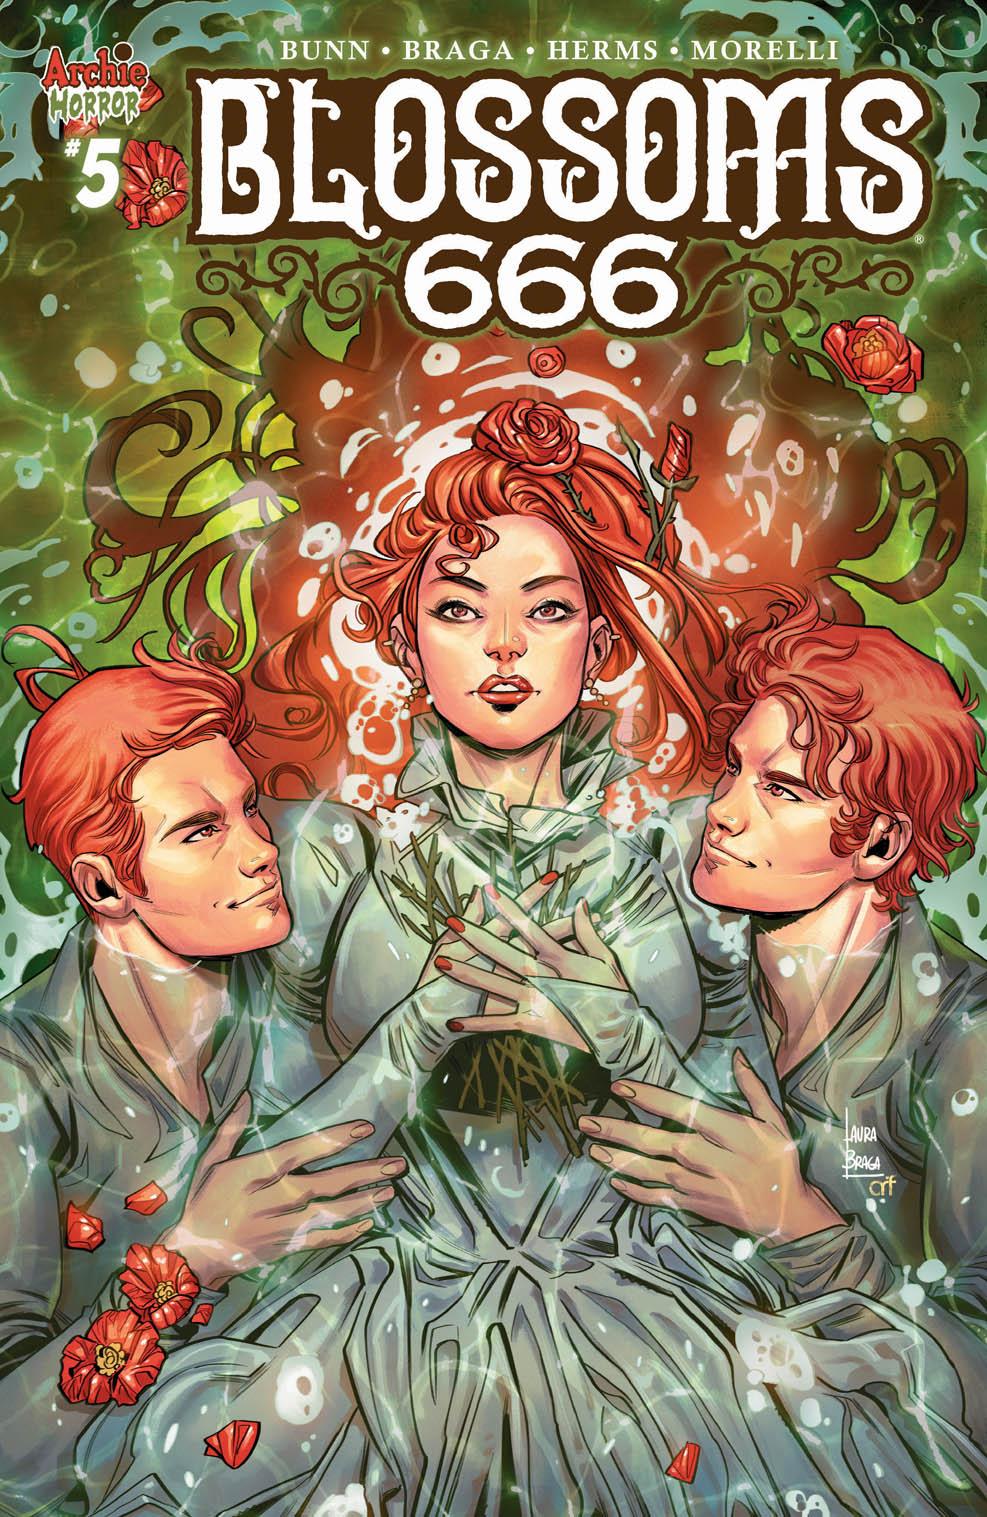 BLOSSOMS 666 #5: CVR A Braga